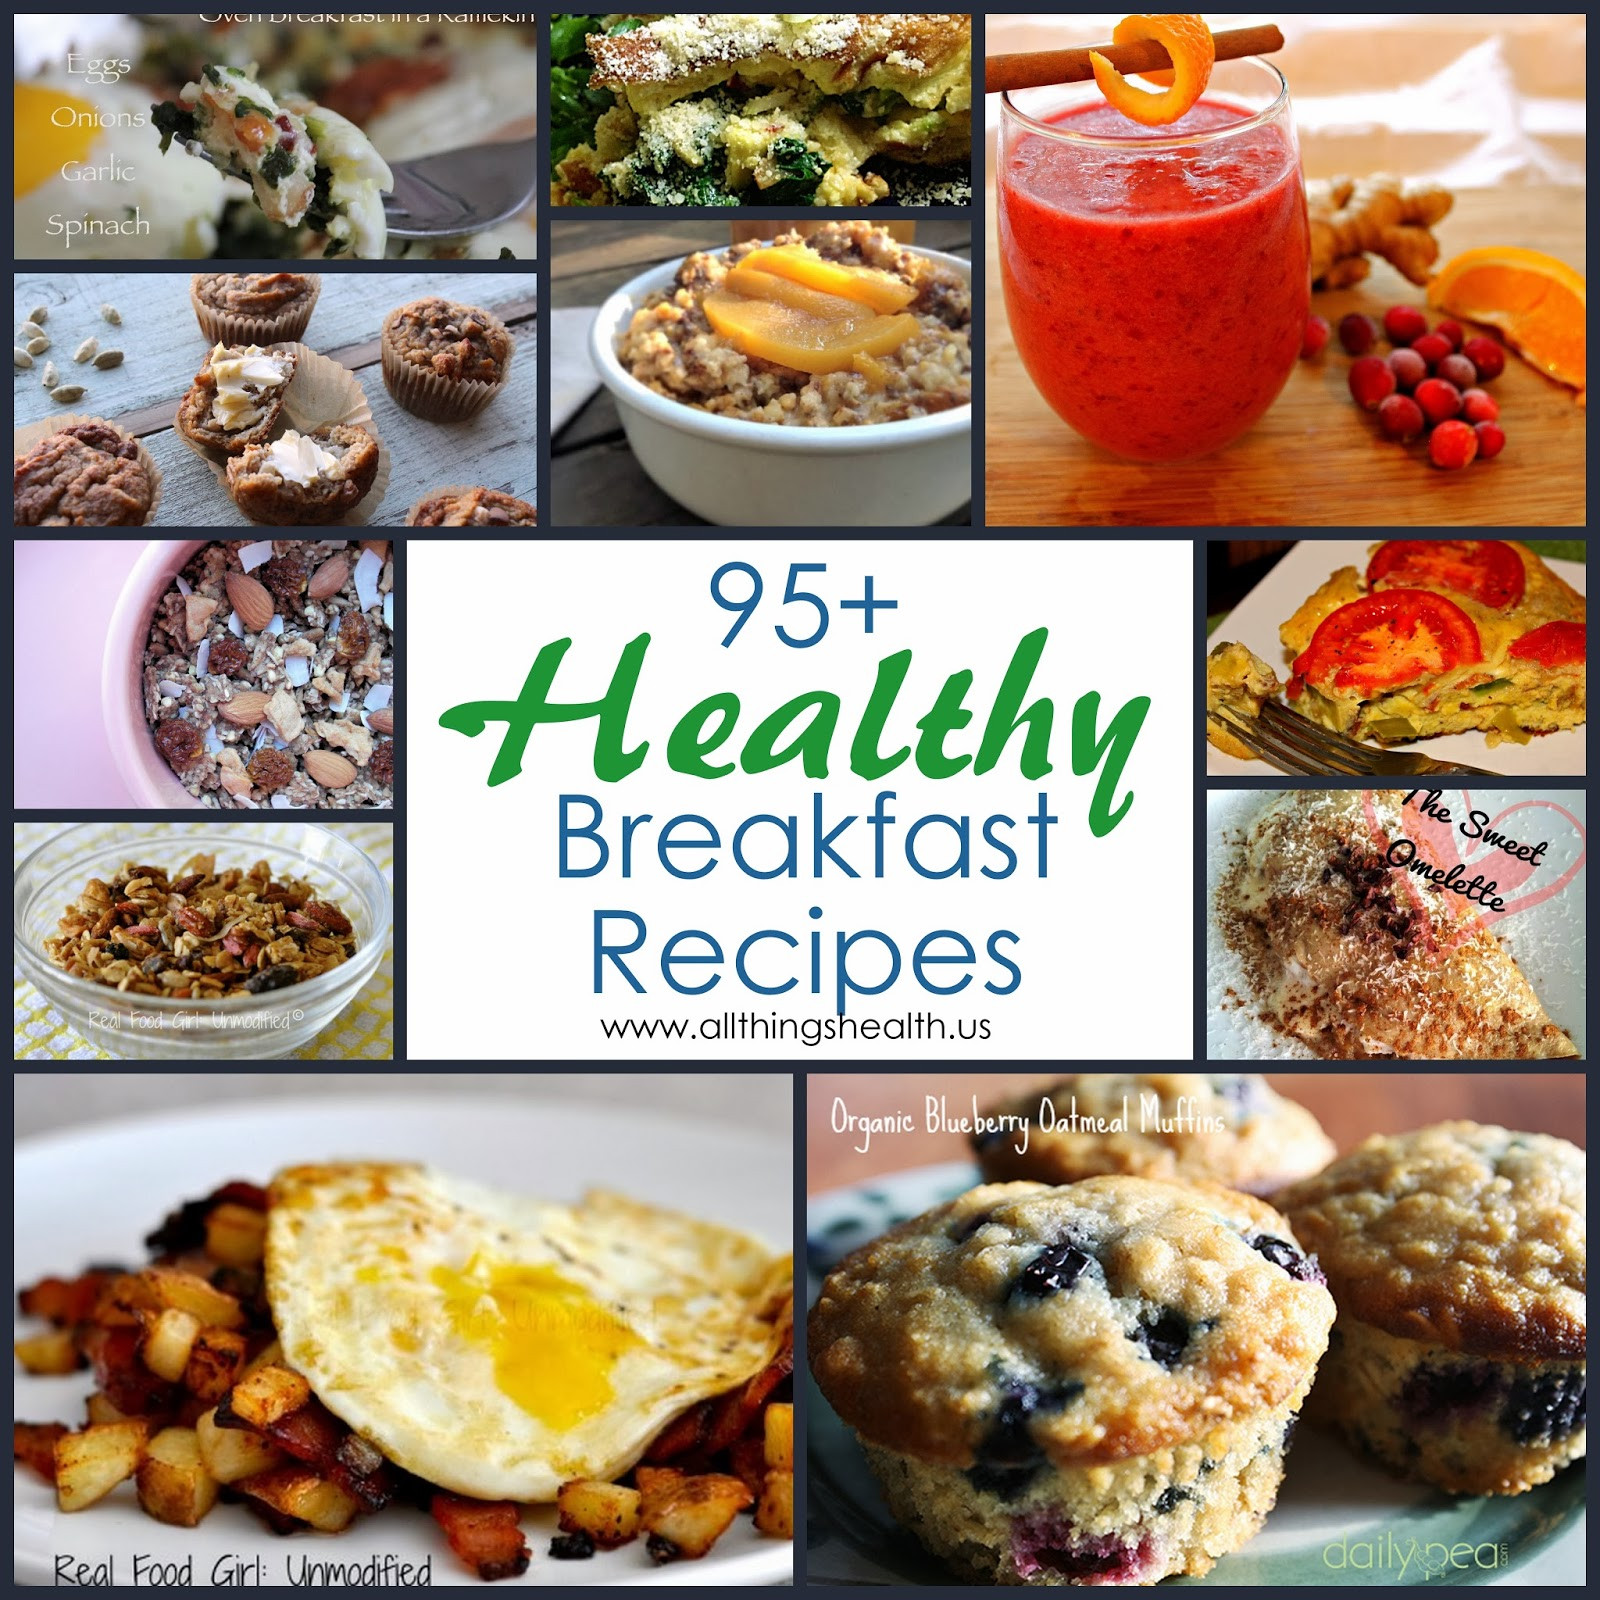 Healthy Breakfast Items  All Things Health 95 Healthy Breakfast Recipes